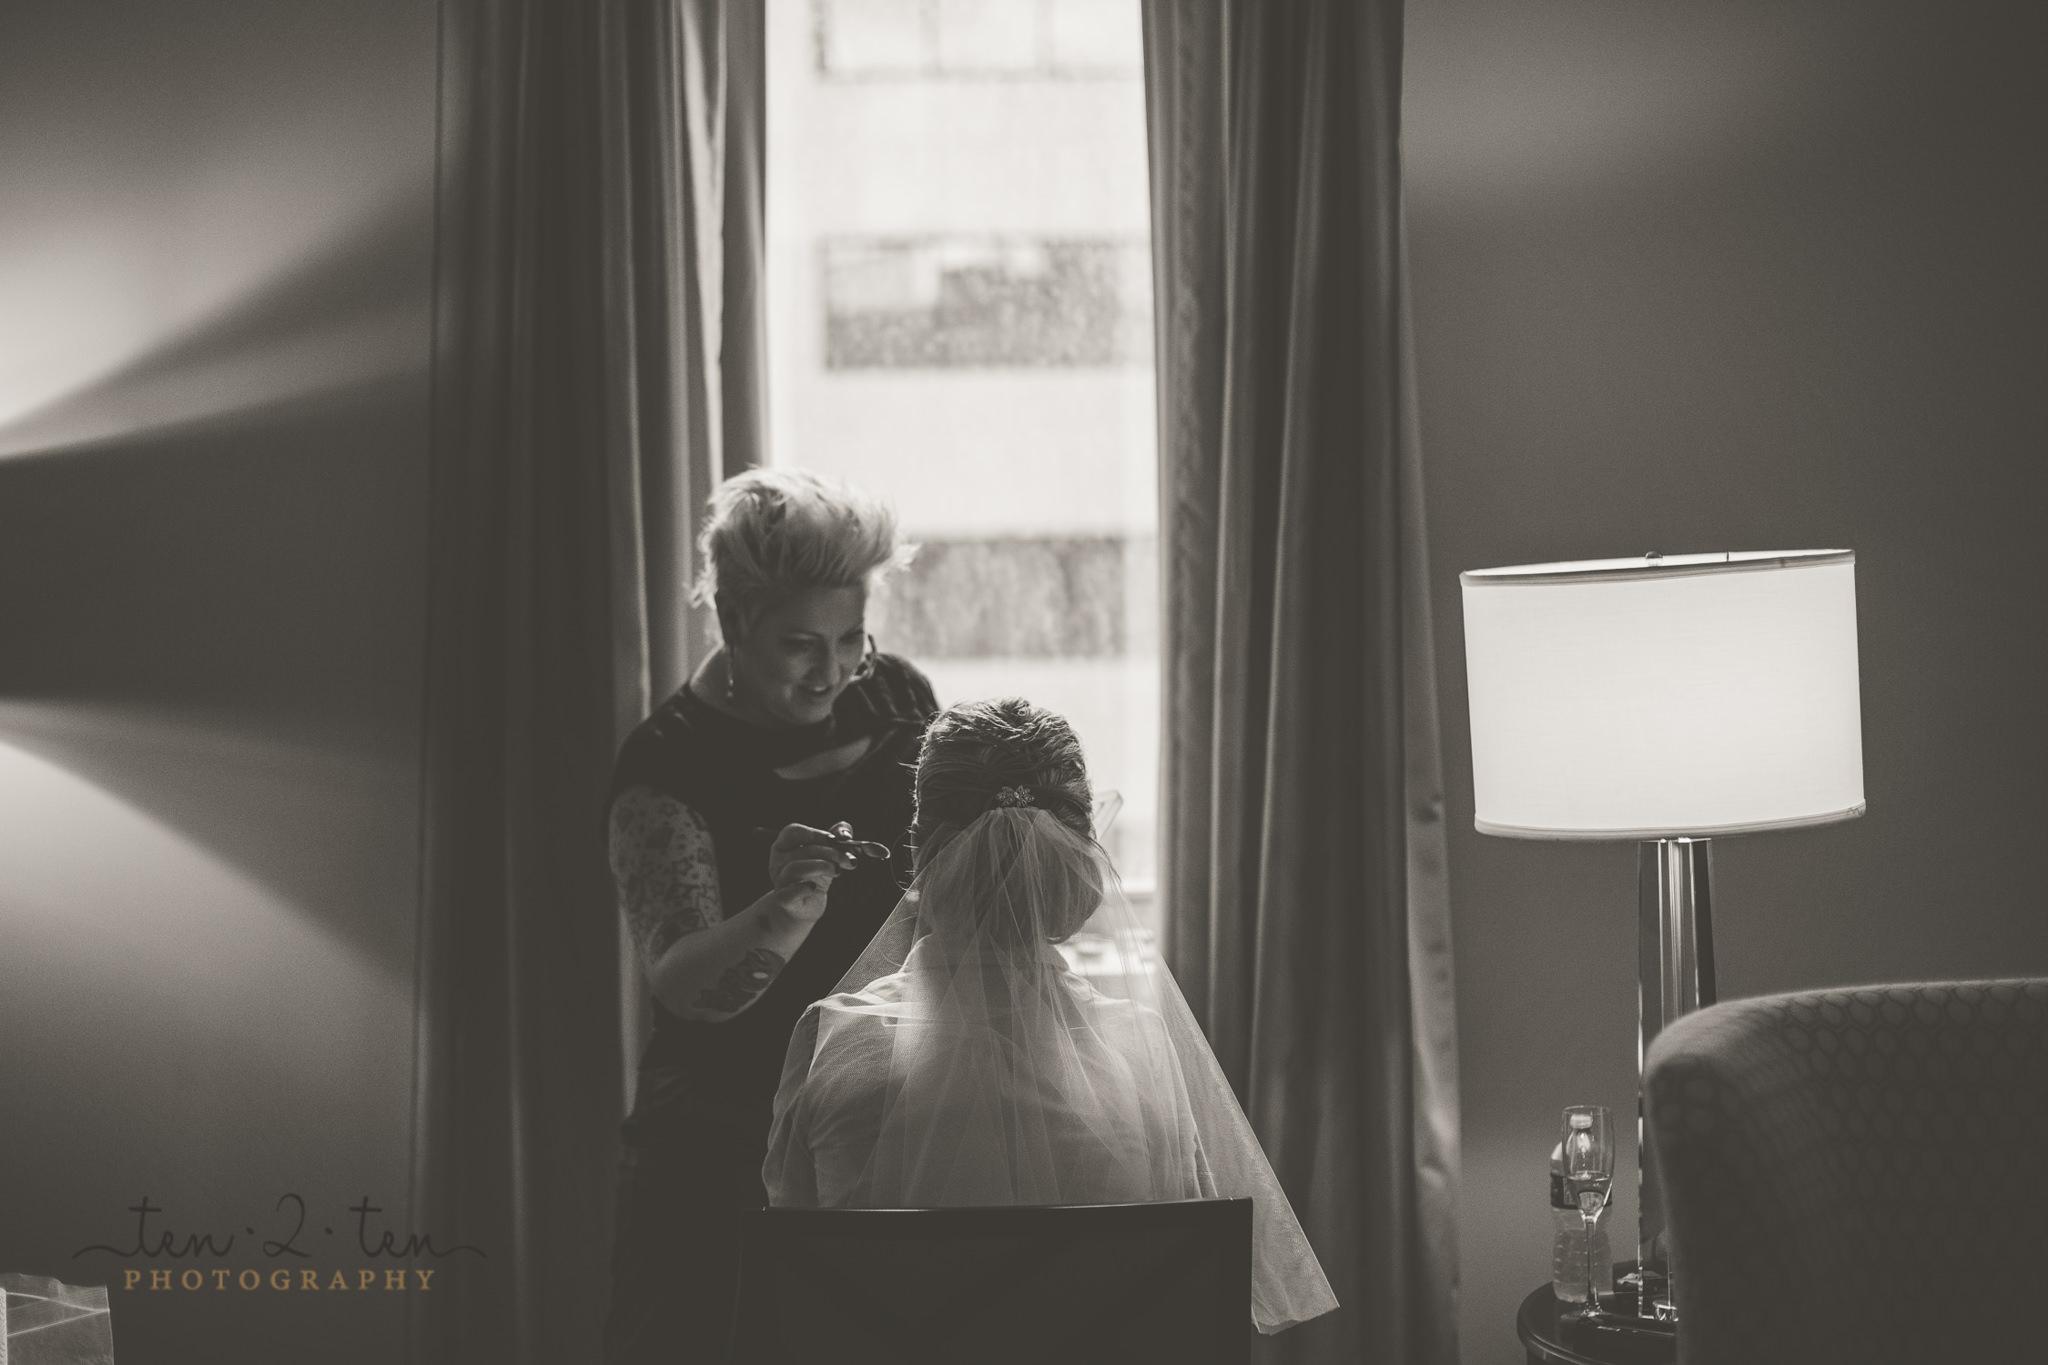 king edward hotel wedding, king edward hotel wedding photos, king edward hotel wedding photography, king edward wedding, king edward wedding photos, rosewater room wedding photos